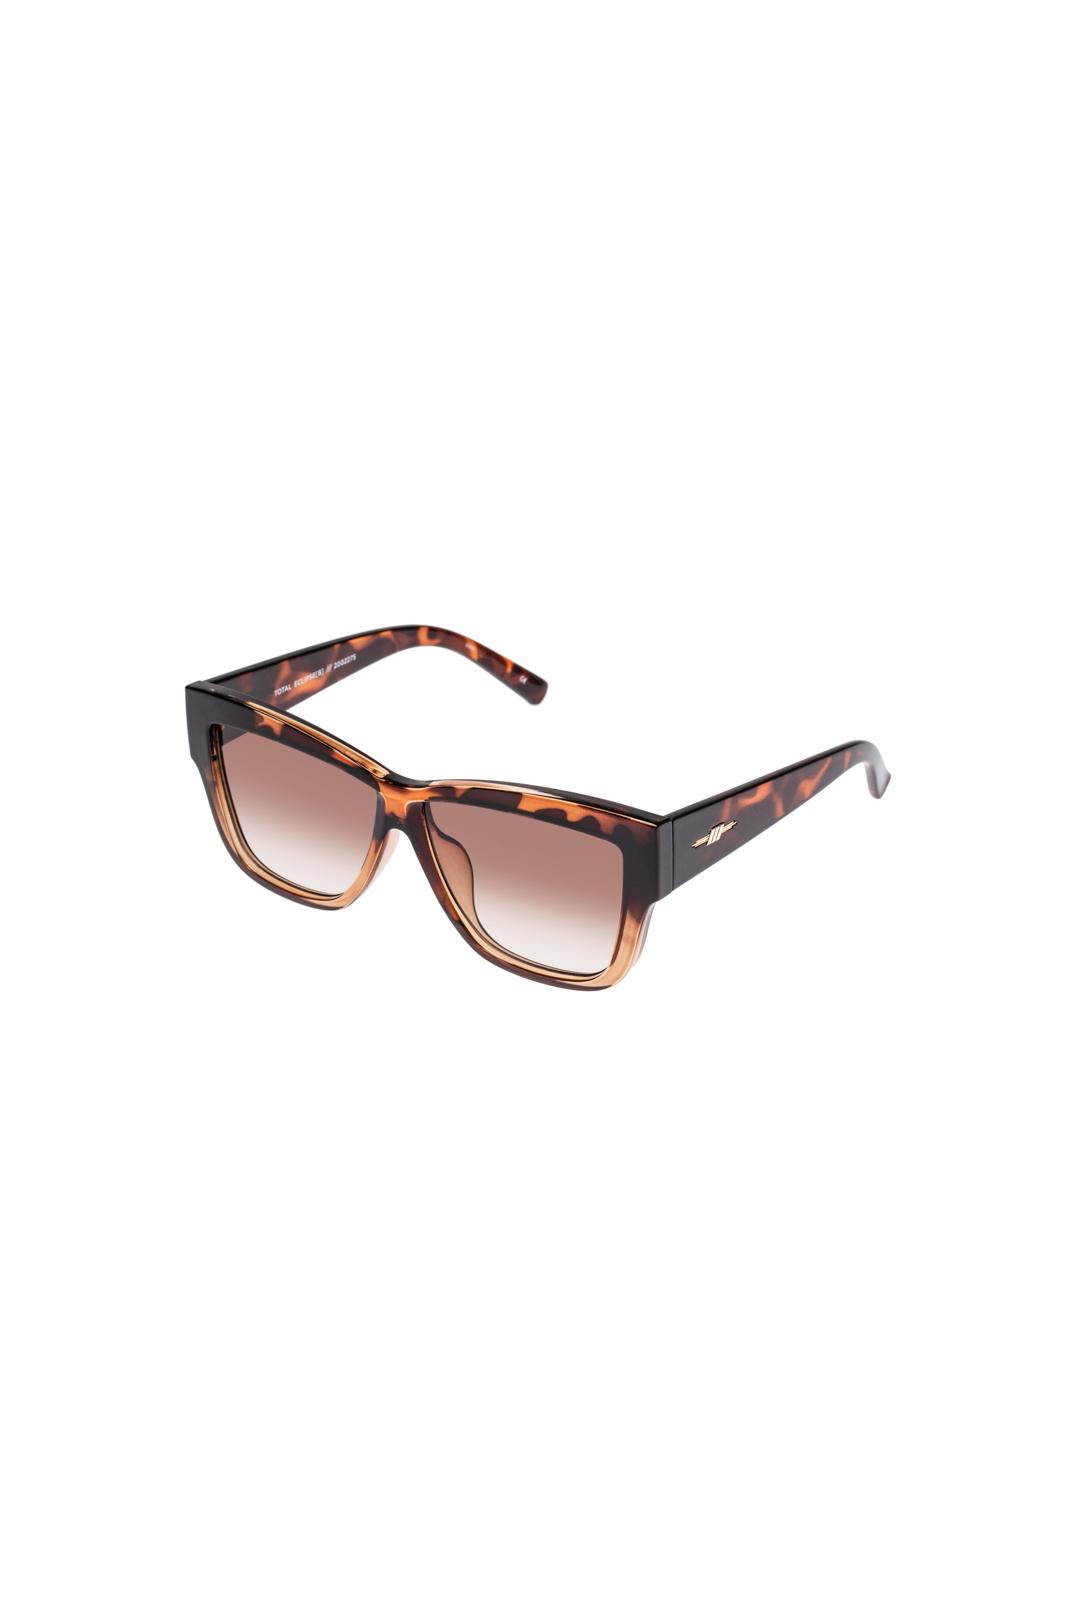 Total Eclipse Sunglasses - Tortoise Tan-3